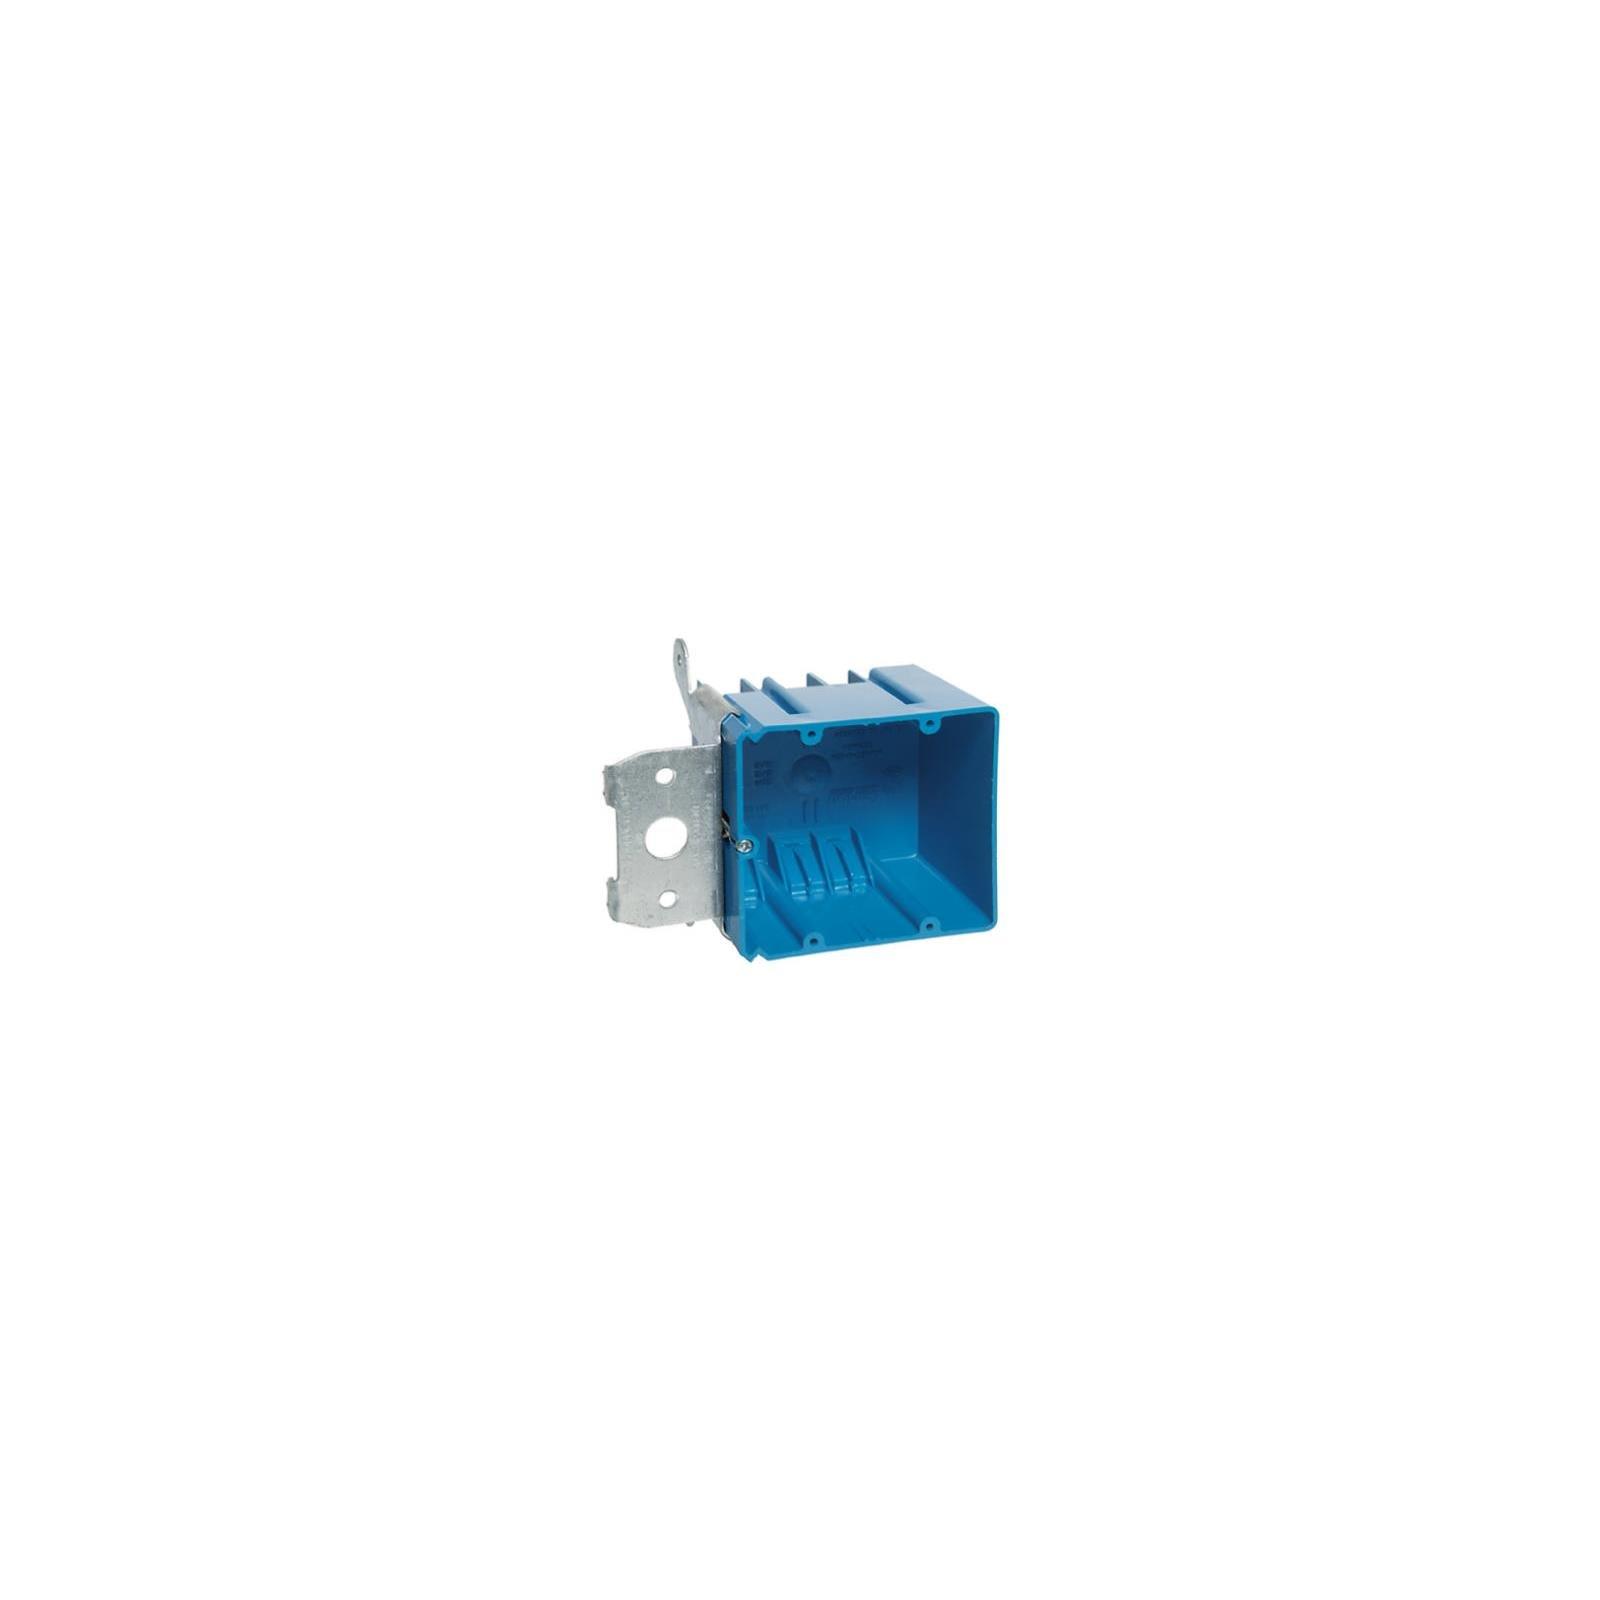 Carlon Lamson & Sessons B234ADJ Adjust-A-Box Two Gang Work Box